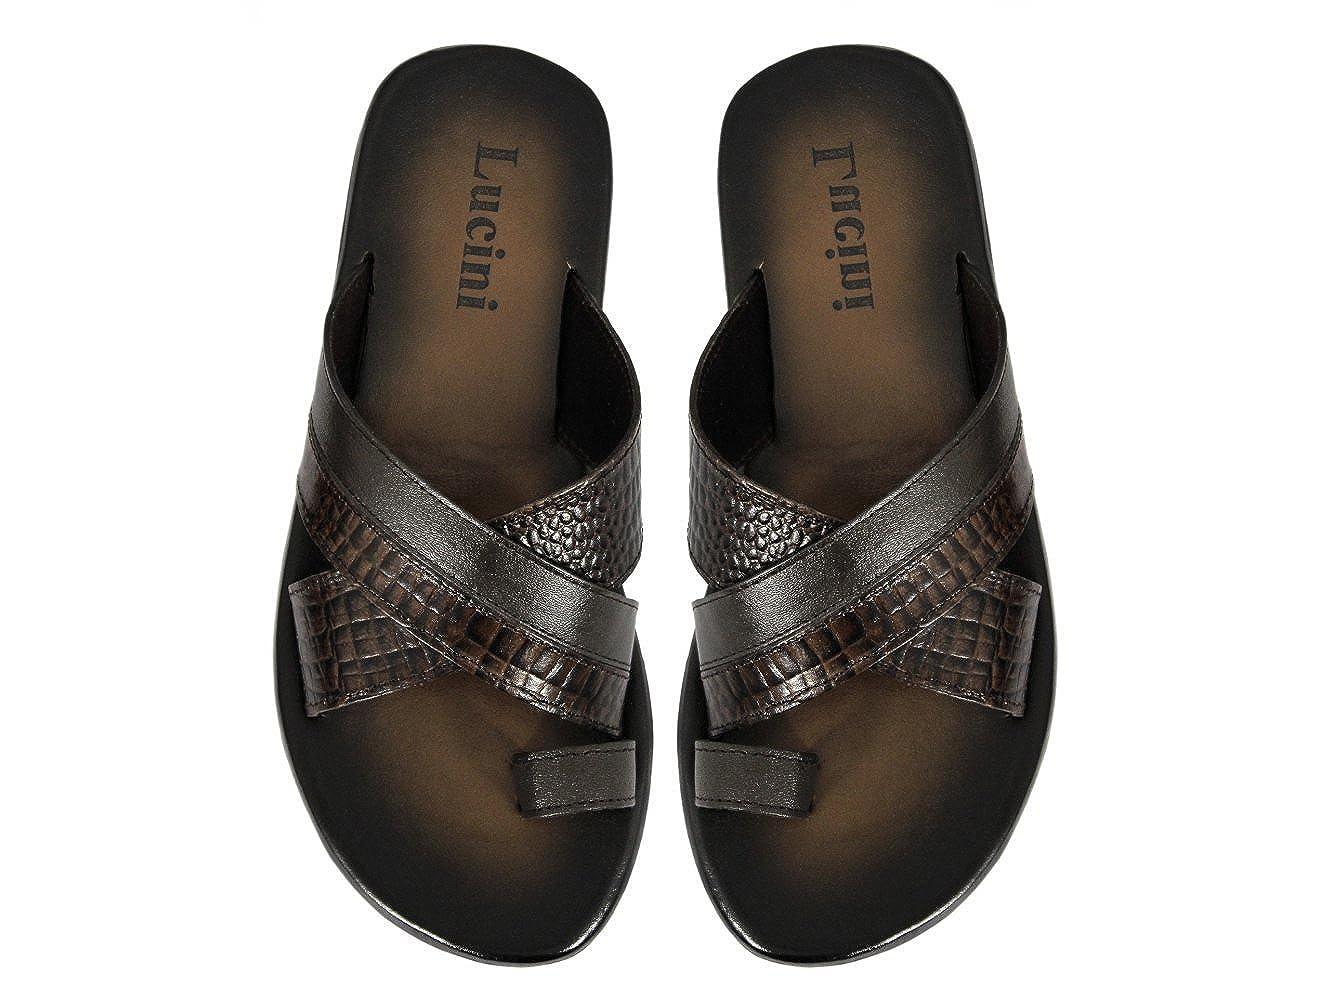 5d66cf2a30e Lucini KAI Mens Leather Mule Sandals Brown UK 12  Amazon.co.uk  Shoes   Bags